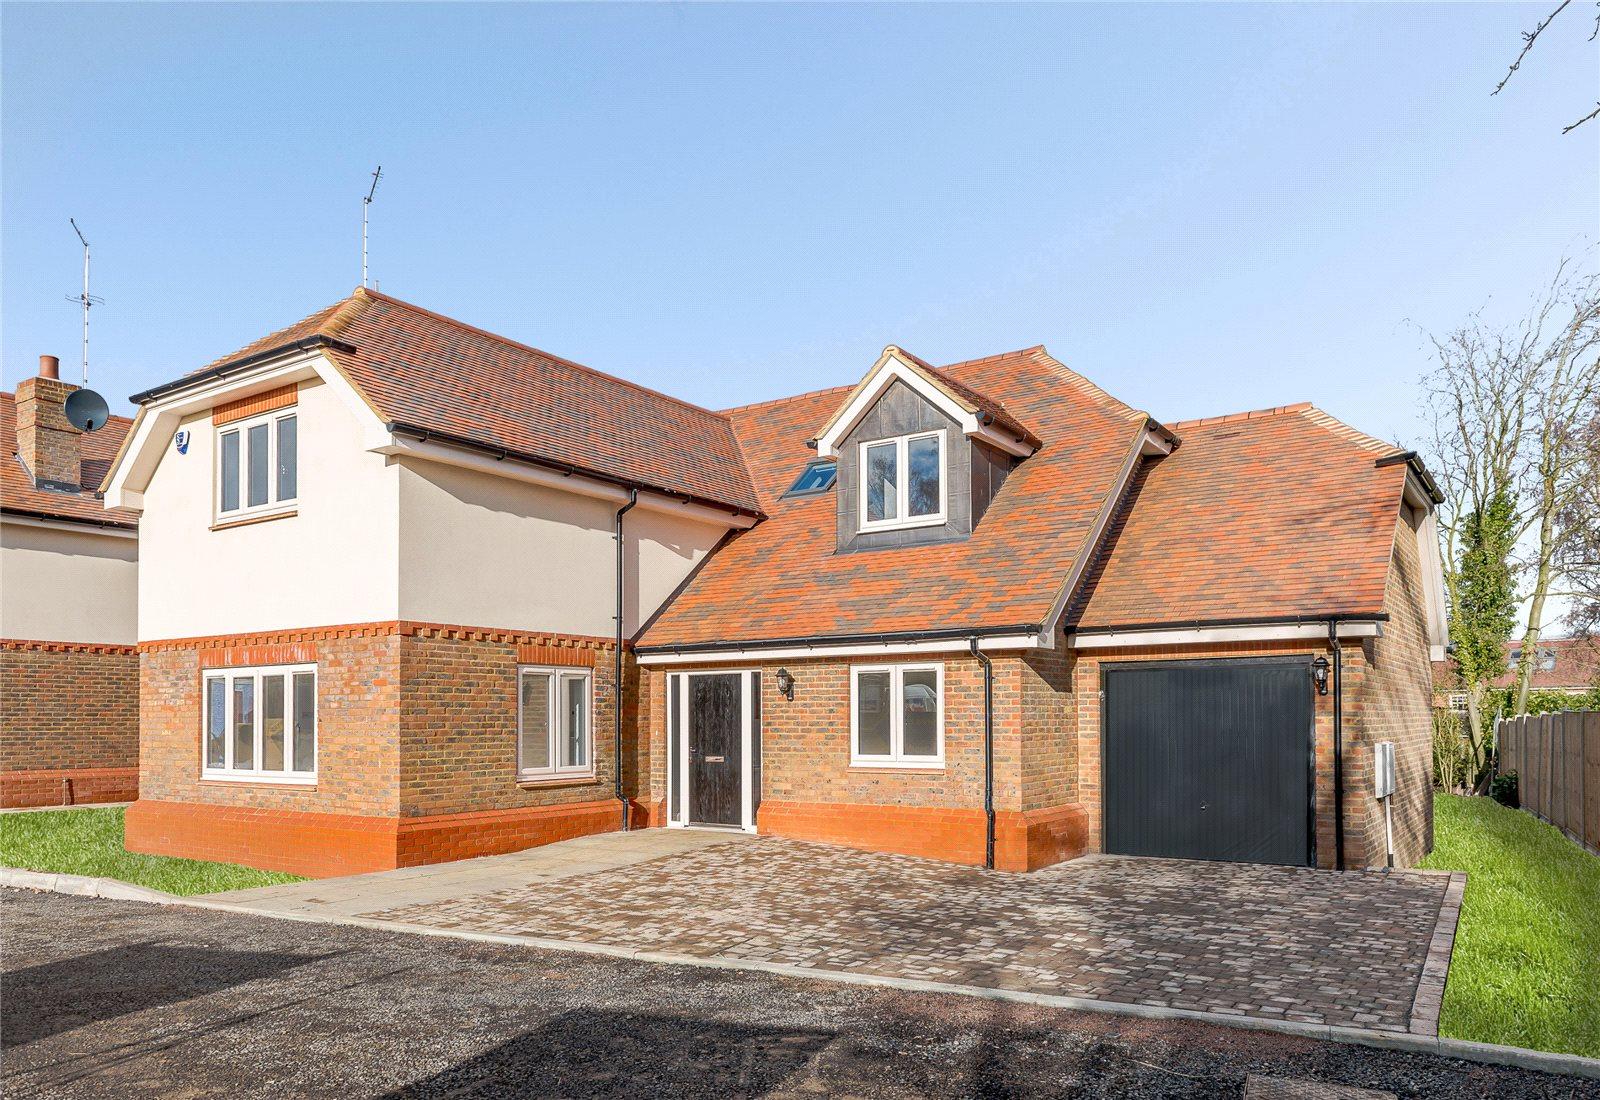 Single Family Home for Sale at Osprey Close, Harpenden, Hertfordshire, AL5 Harpenden, England